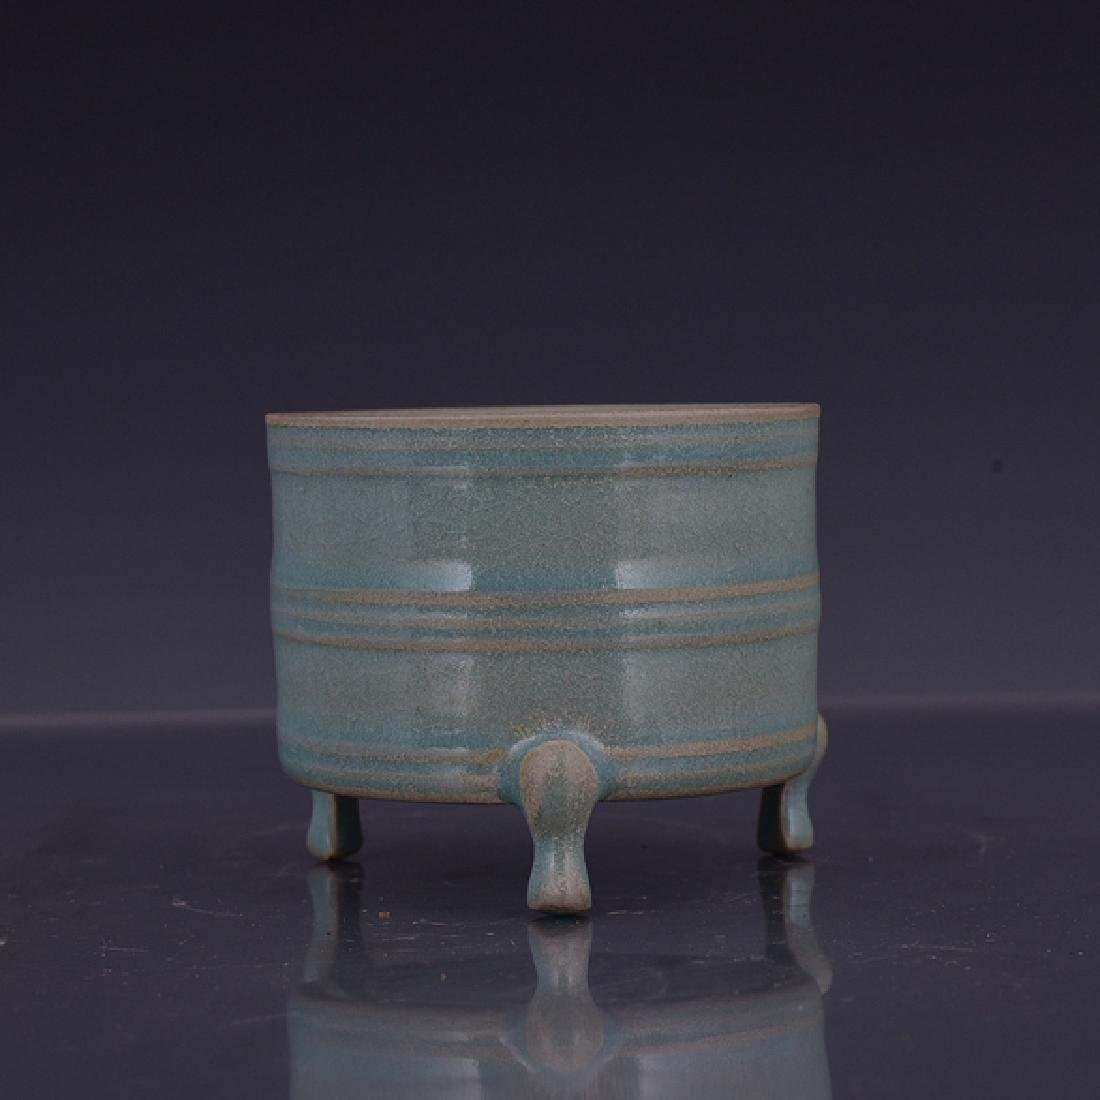 Chinese Ru Ware Tripod Censer